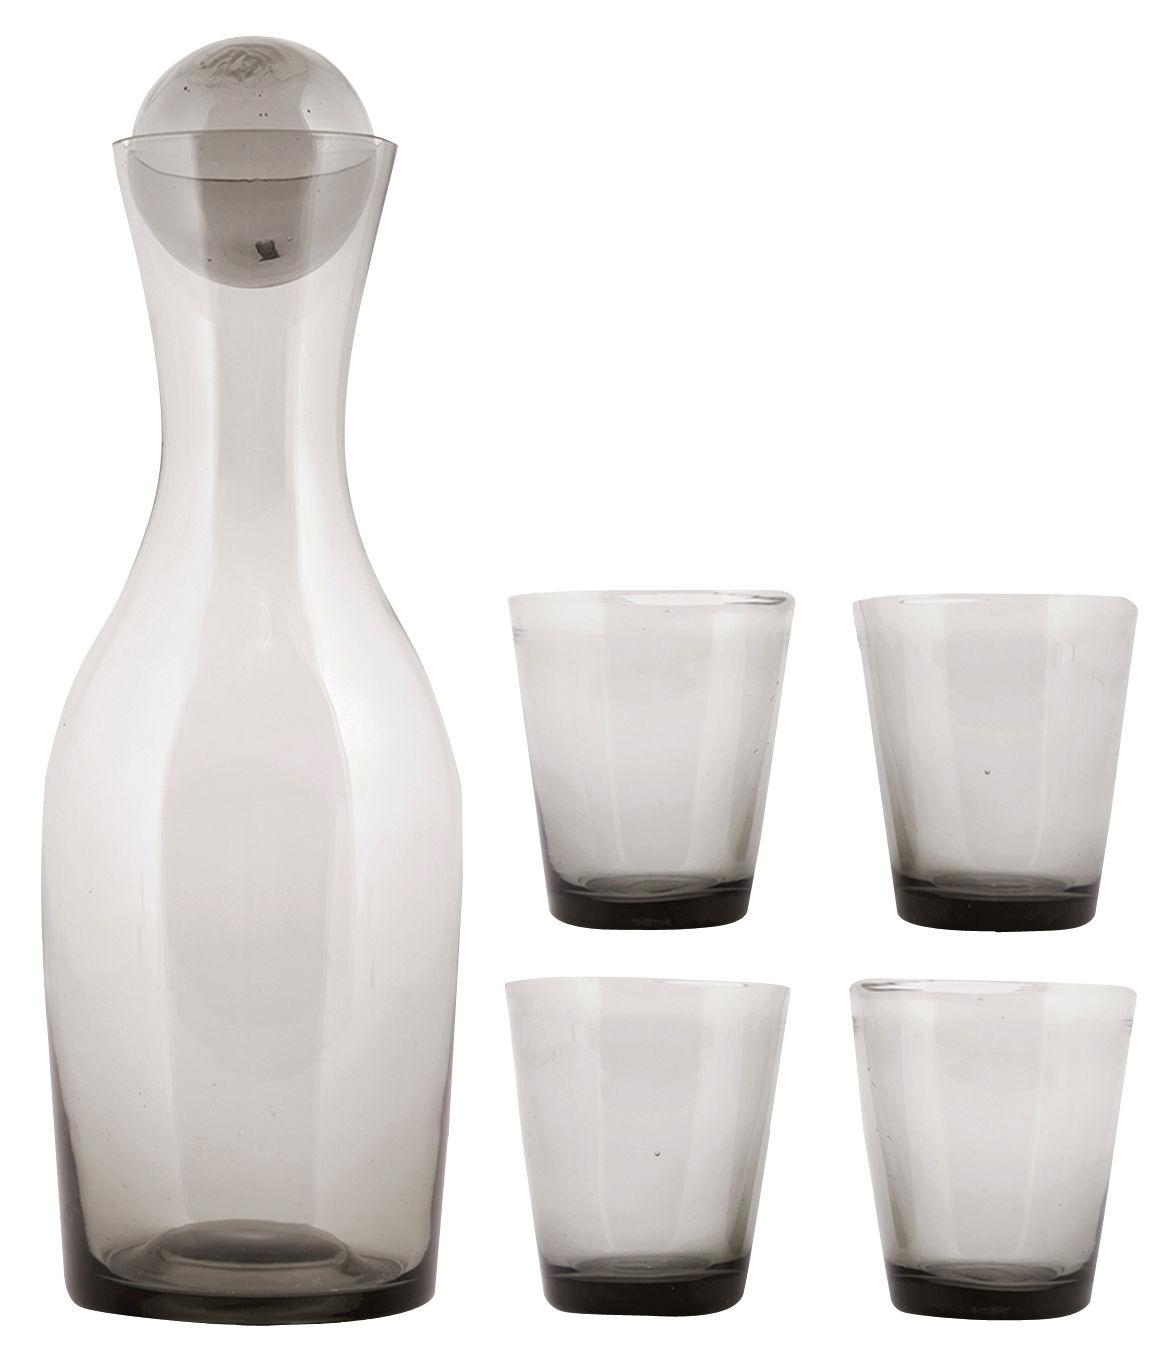 Tavola - Bicchieri  - Caraffa Houston / Set caraffa + 4 bicchieri - House Doctor - Fumé - Vetro